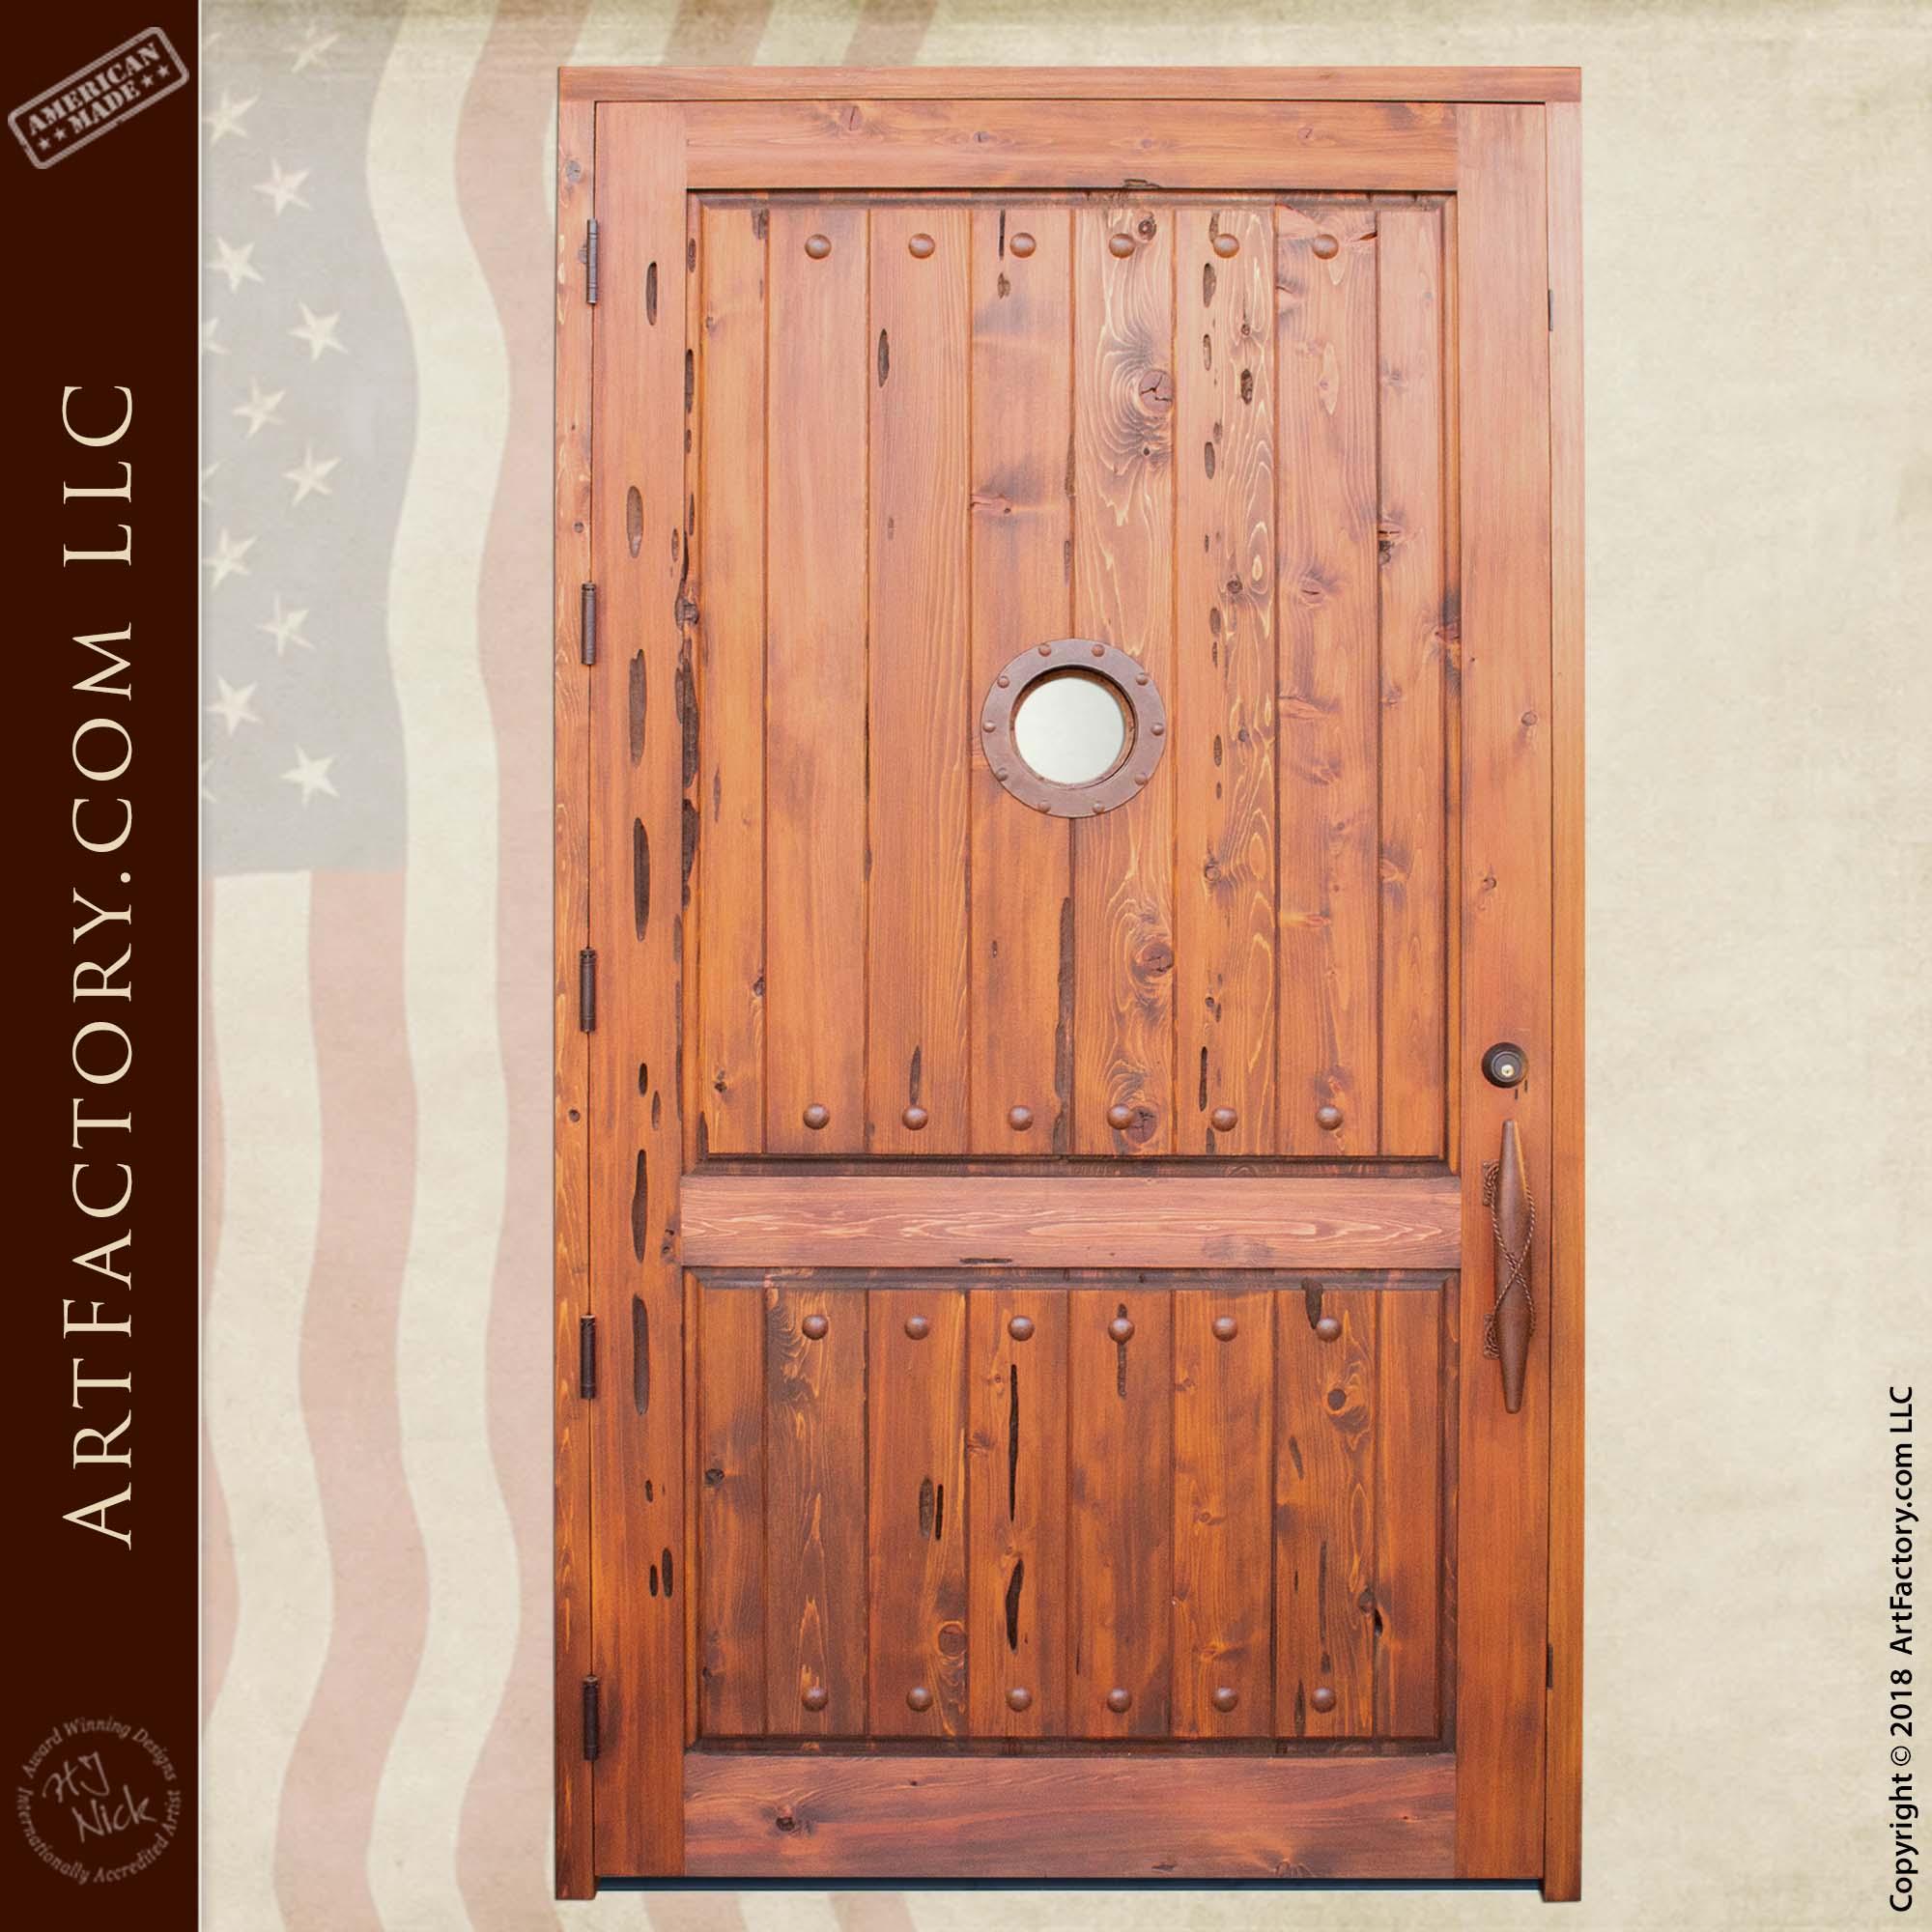 Nautical Theme Door with Portal Window